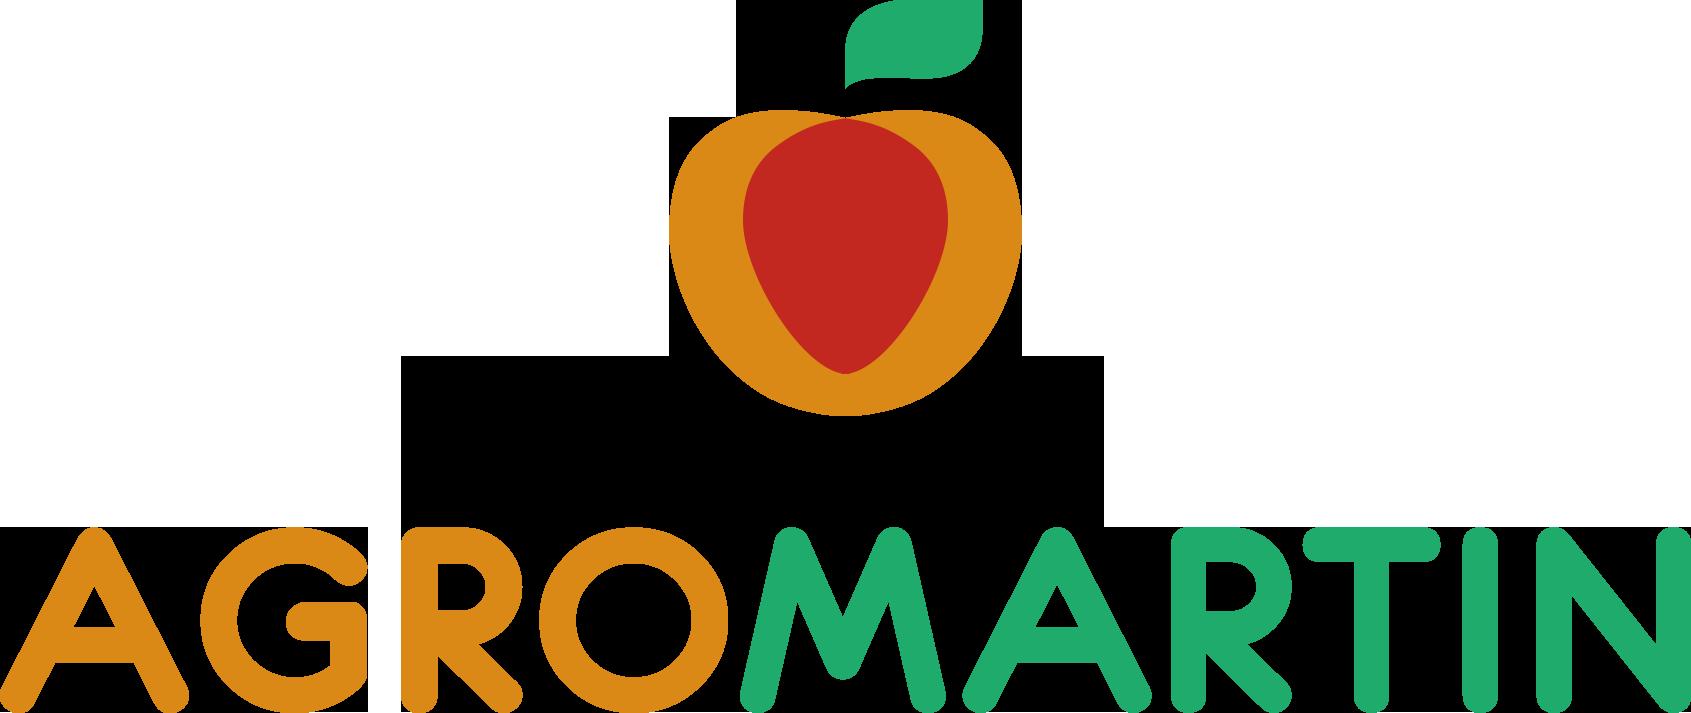 AgroMartin | Productores de fresa en Lepe Huelva